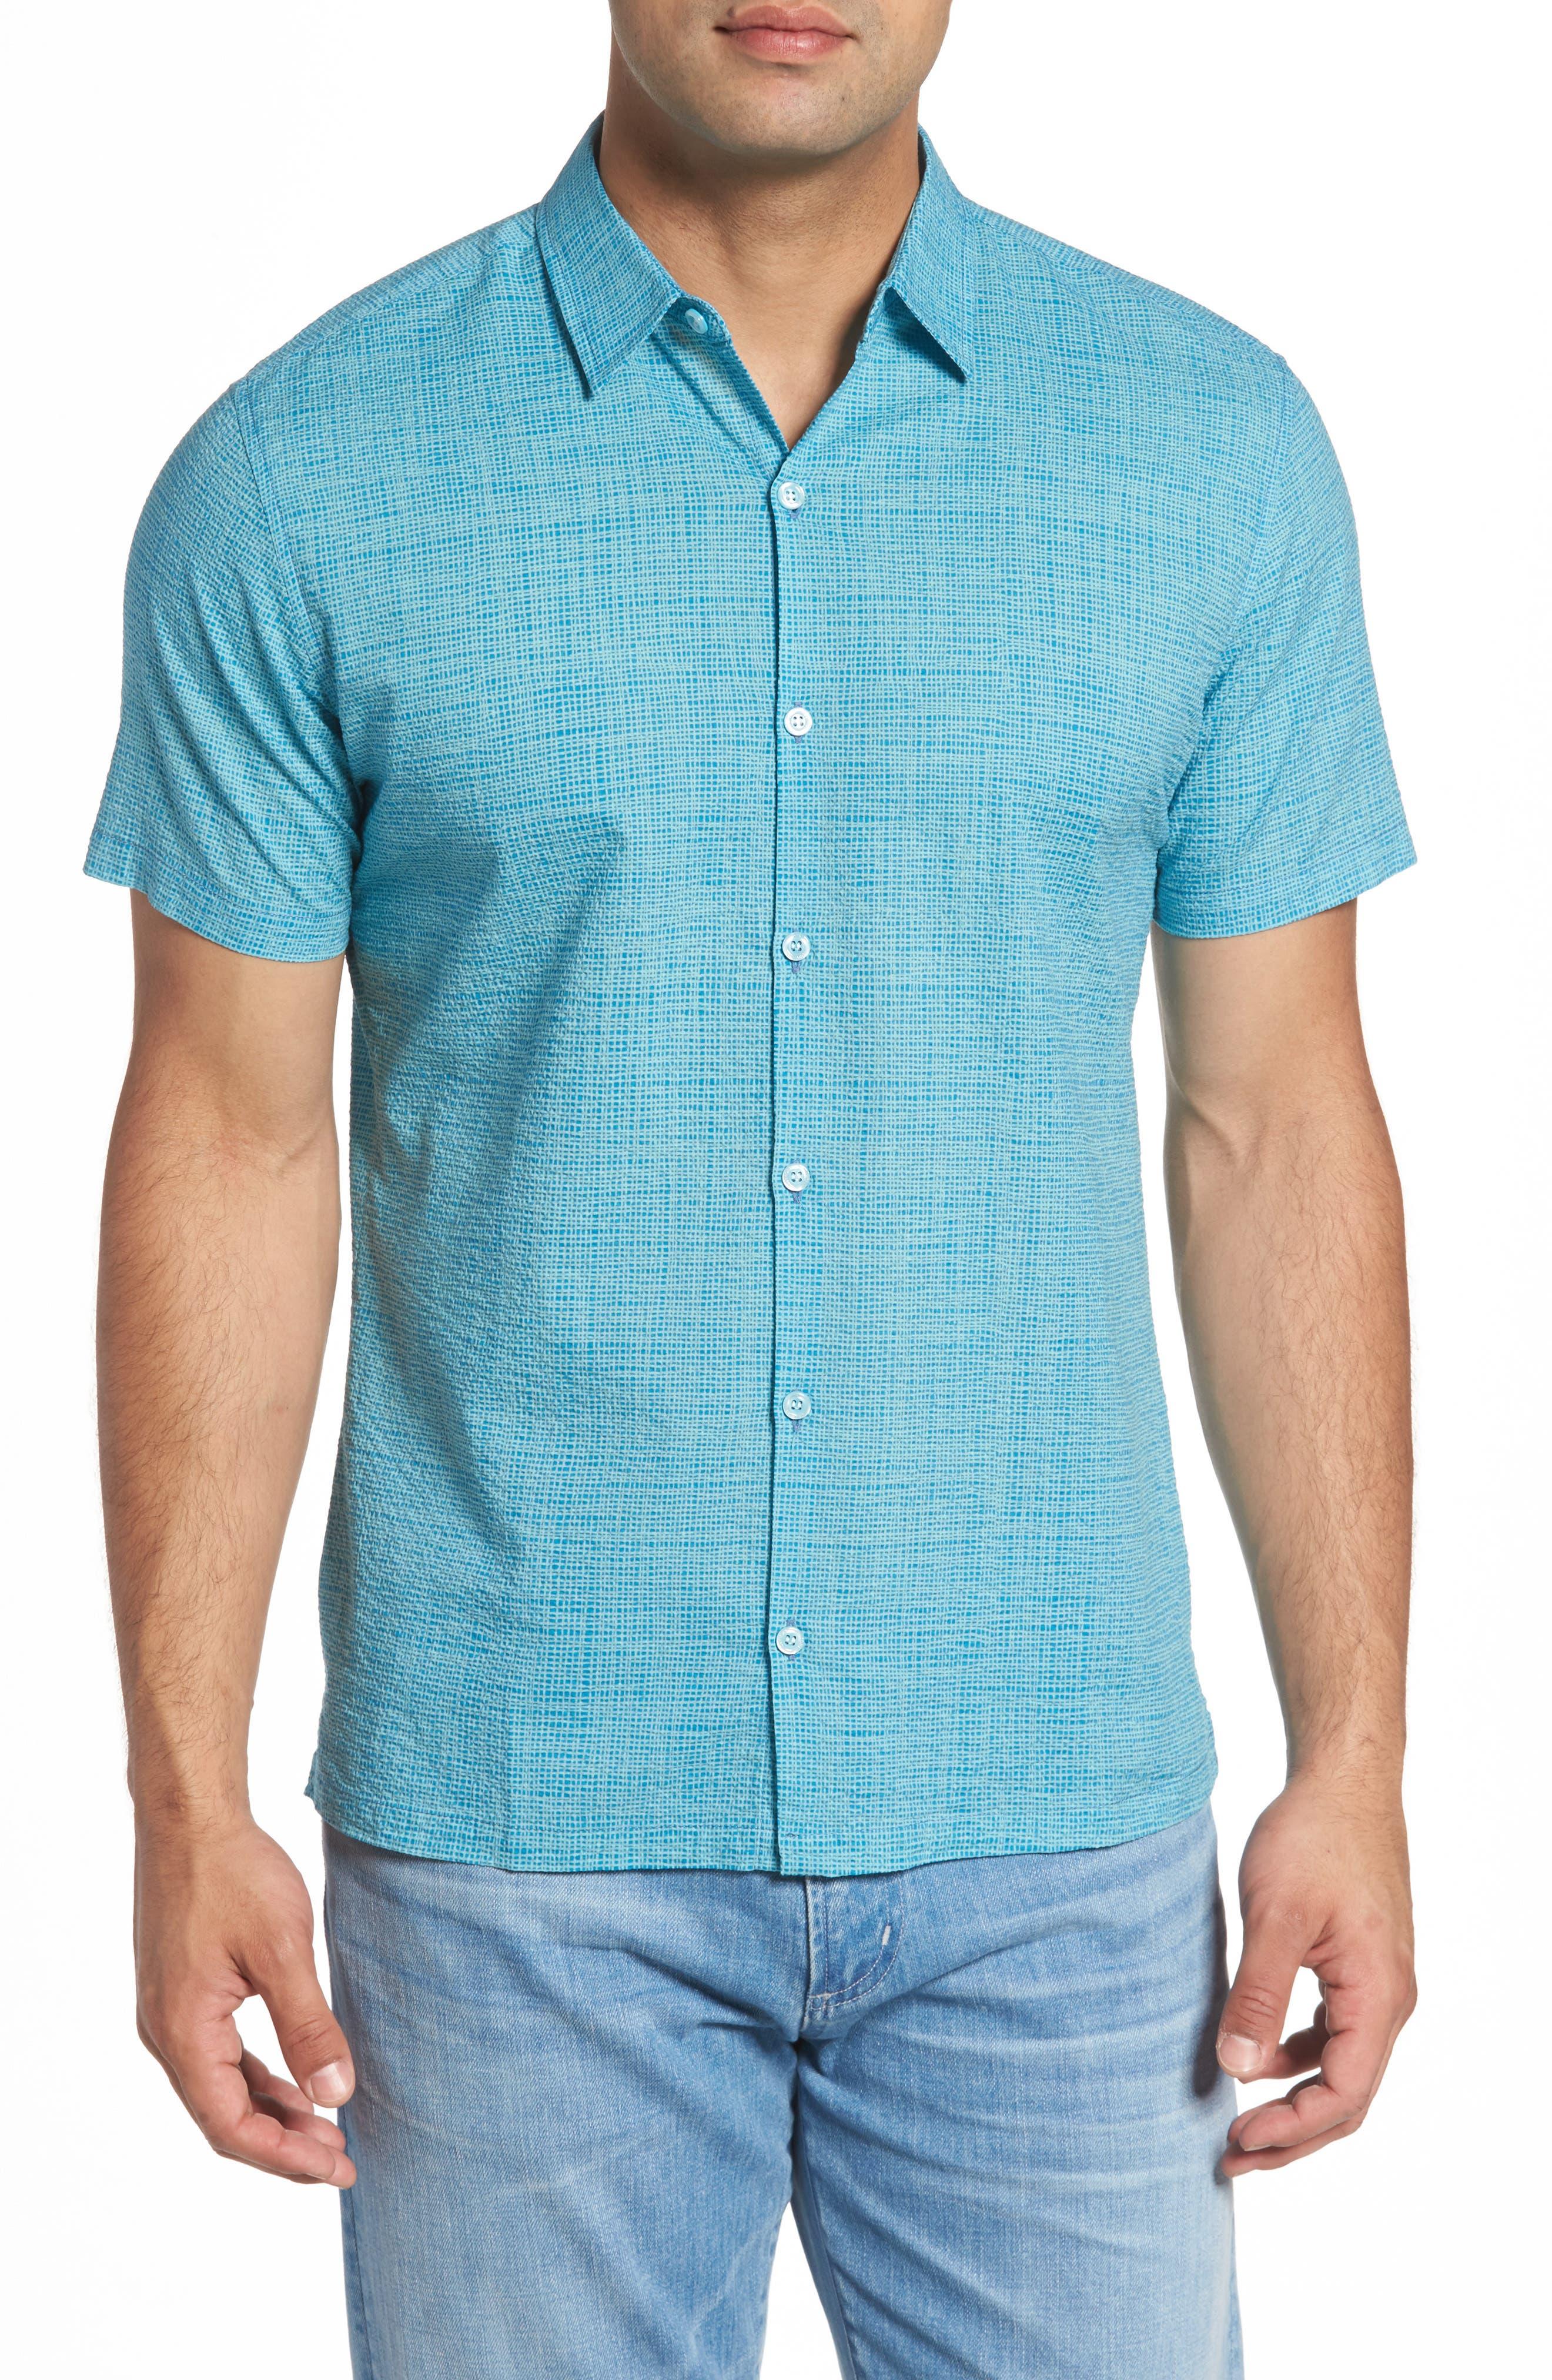 Alternate Image 1 Selected - Tori Richard Net Worth Slim Fit Camp Shirt